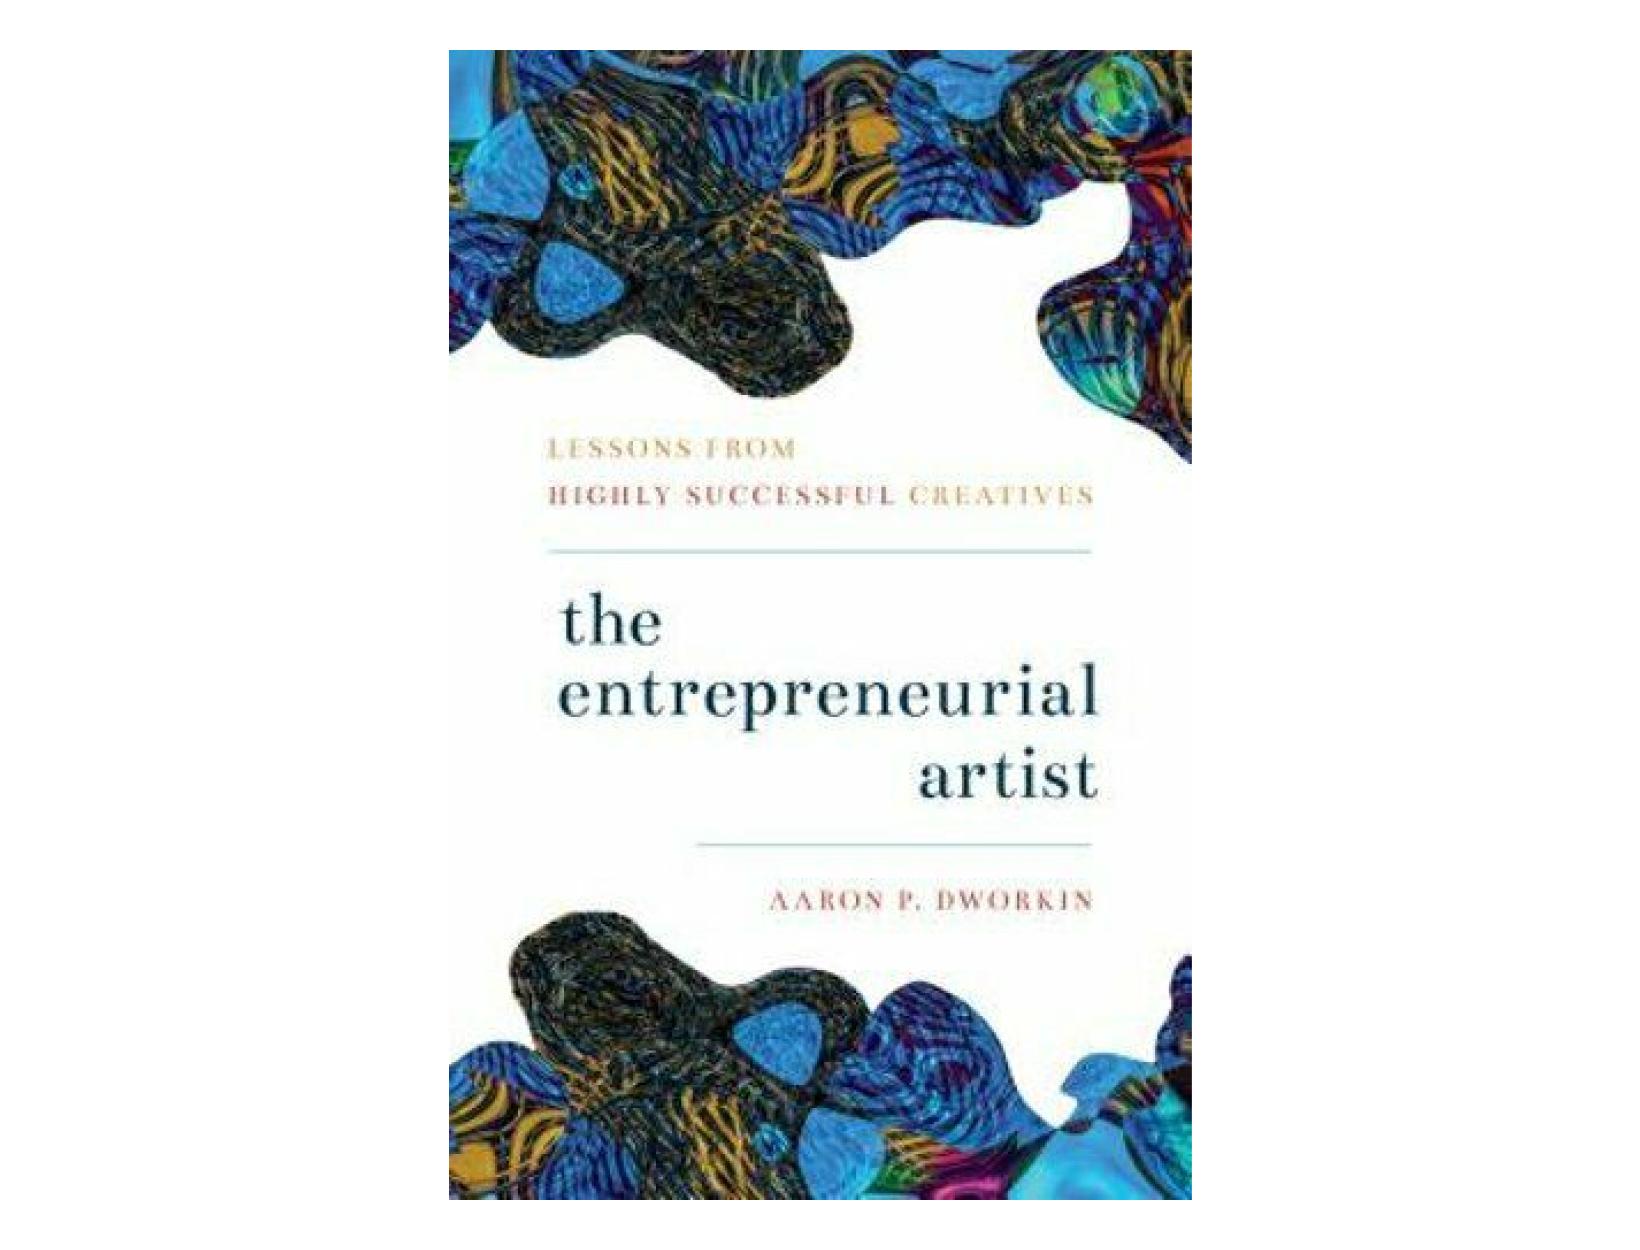 <em>The Entrepreneurial Artist</em> <br>by Aaron P. Dworkin